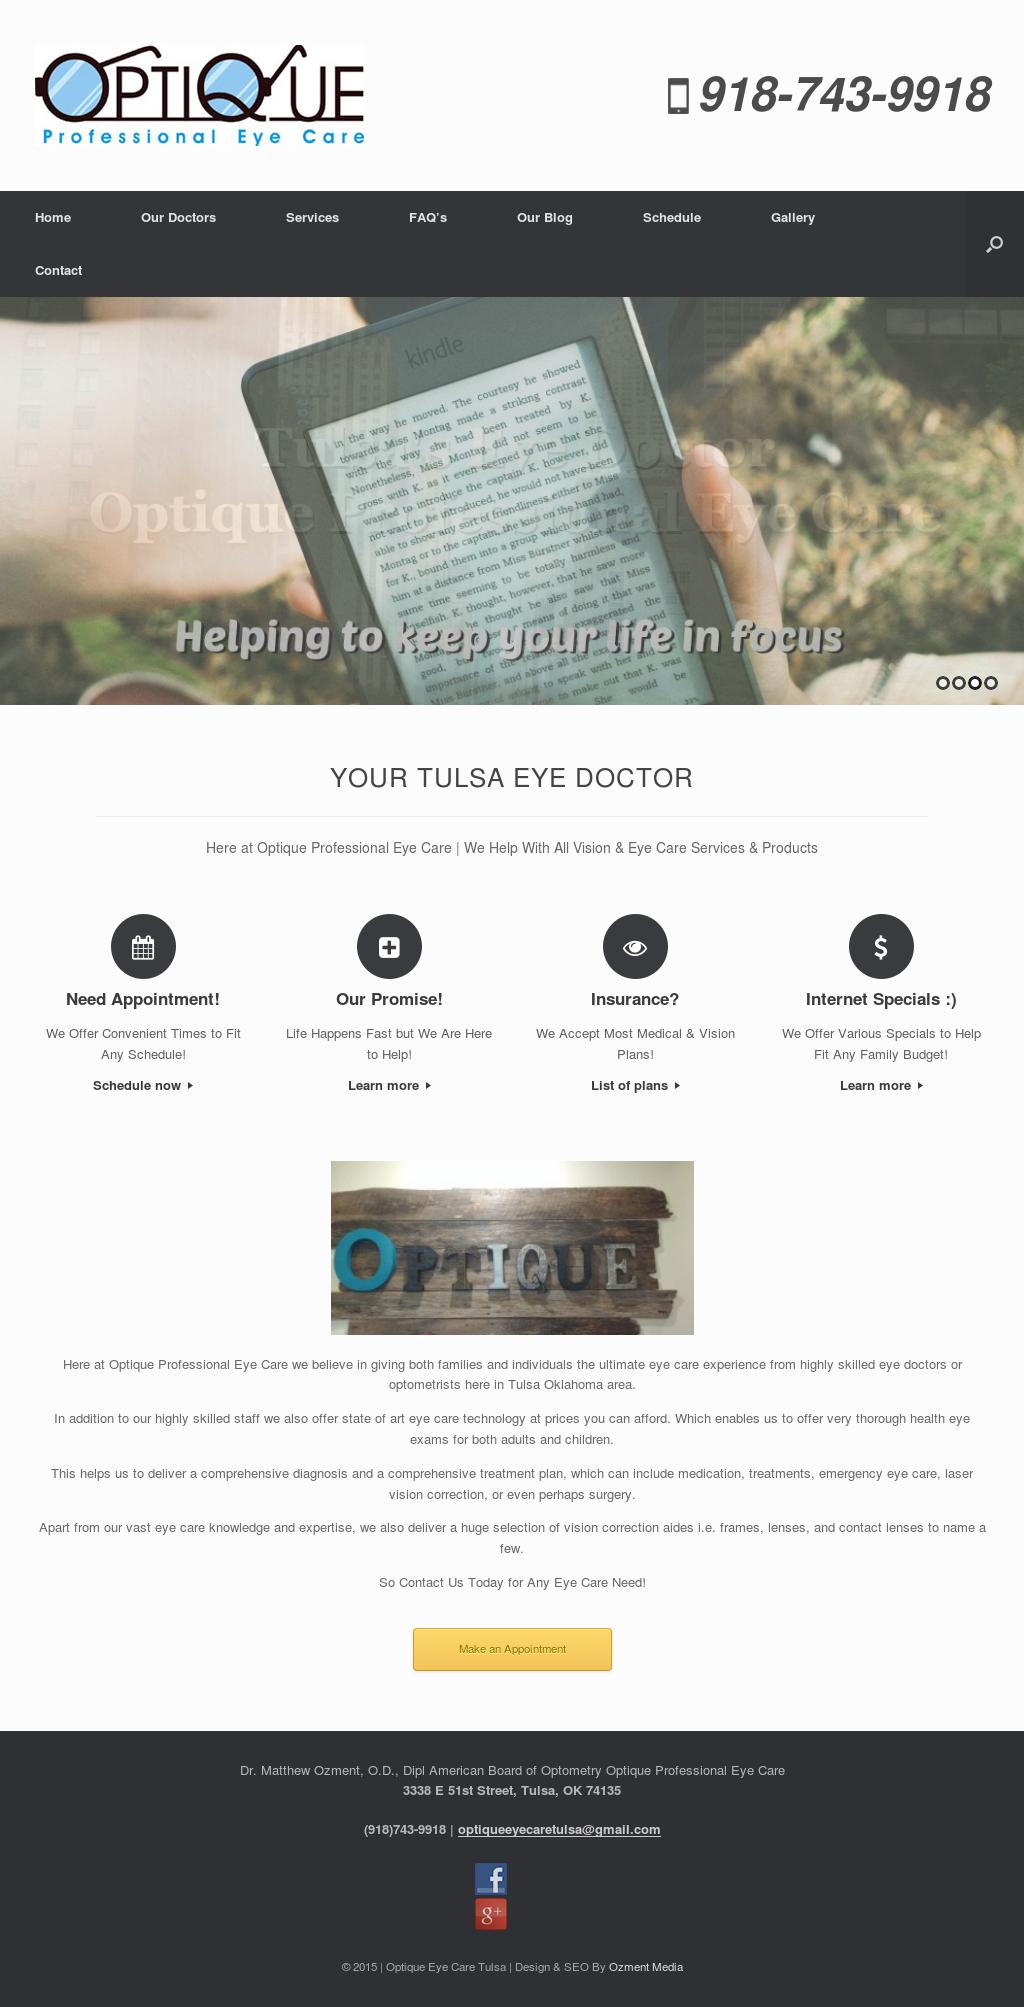 Optique Professional Eye Care, Pllc Competitors, Revenue and ...